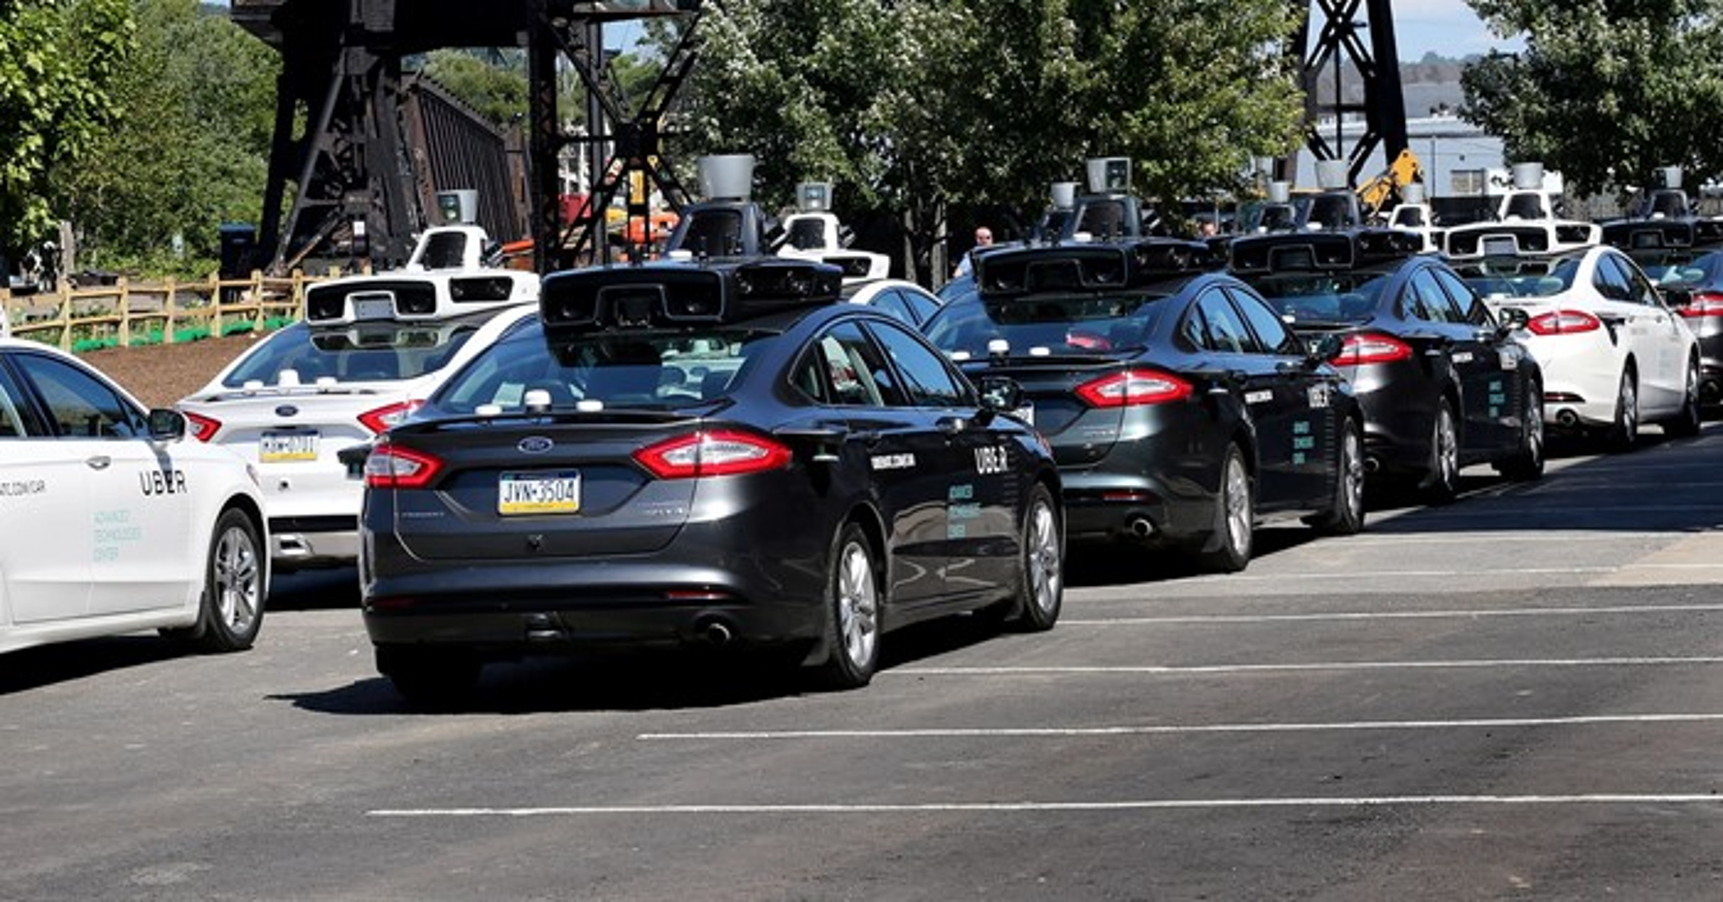 Carros autônomos estacionados